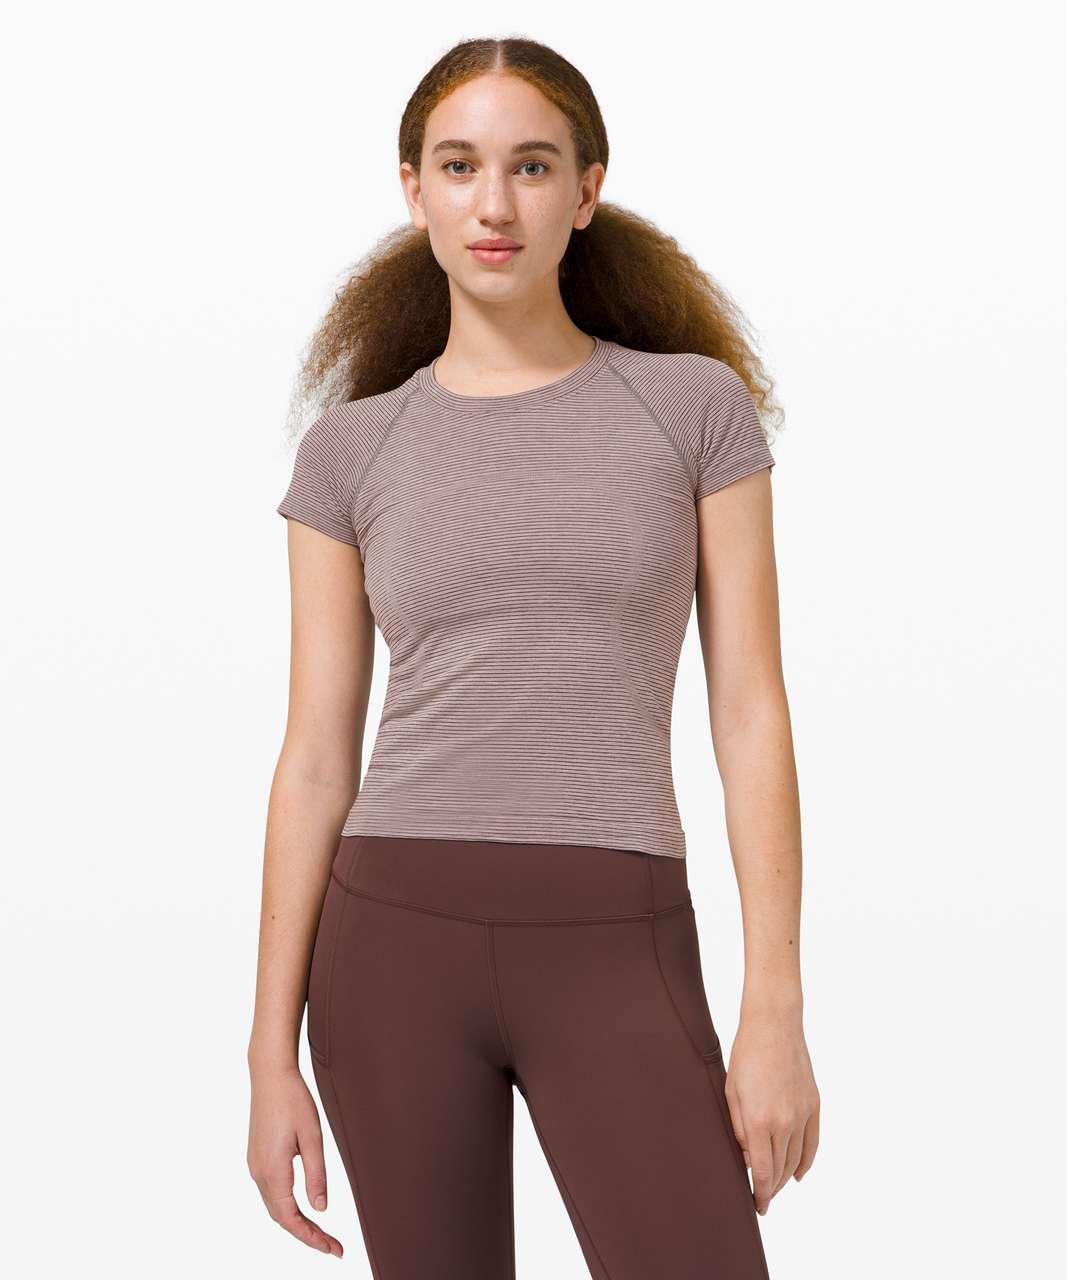 Lululemon Swiftly Tech Short Sleeve 2.0 *Race Length - Tetra Stripe Asphalt Grey / Violet Verbena